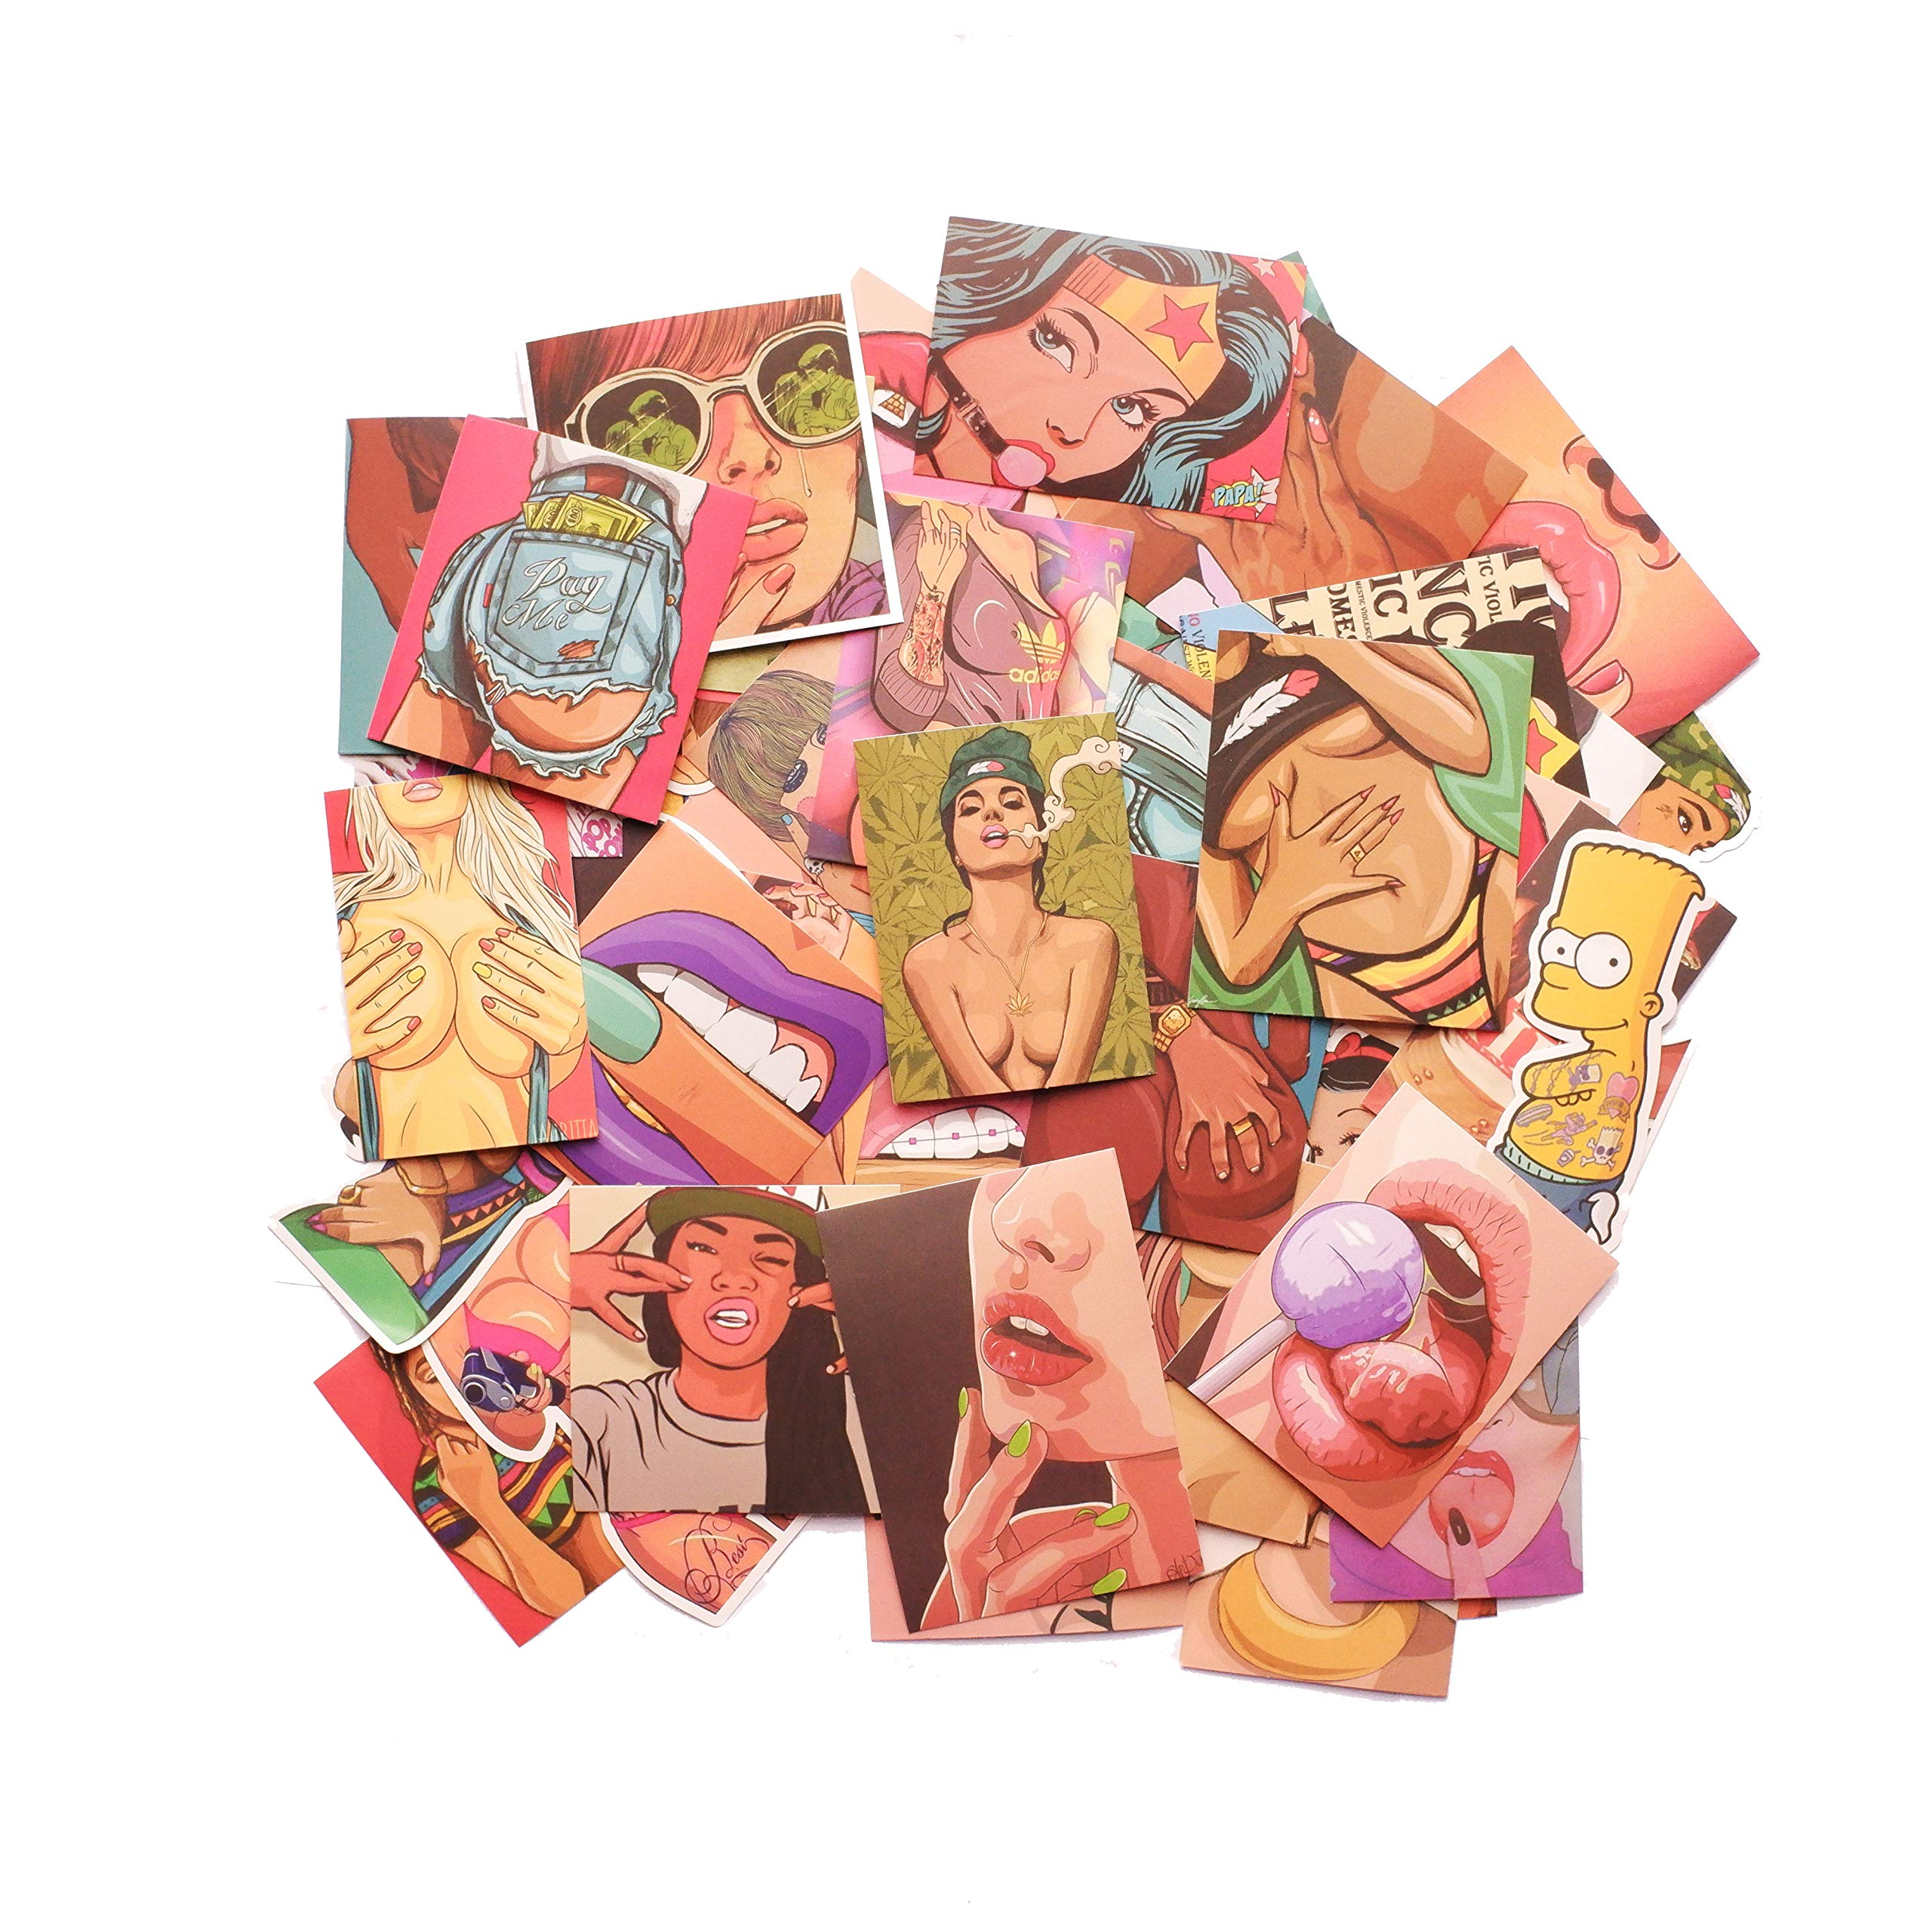 Stickers Calcos 47 un. Sexy Origen U.S.A. (7H6MTB58)